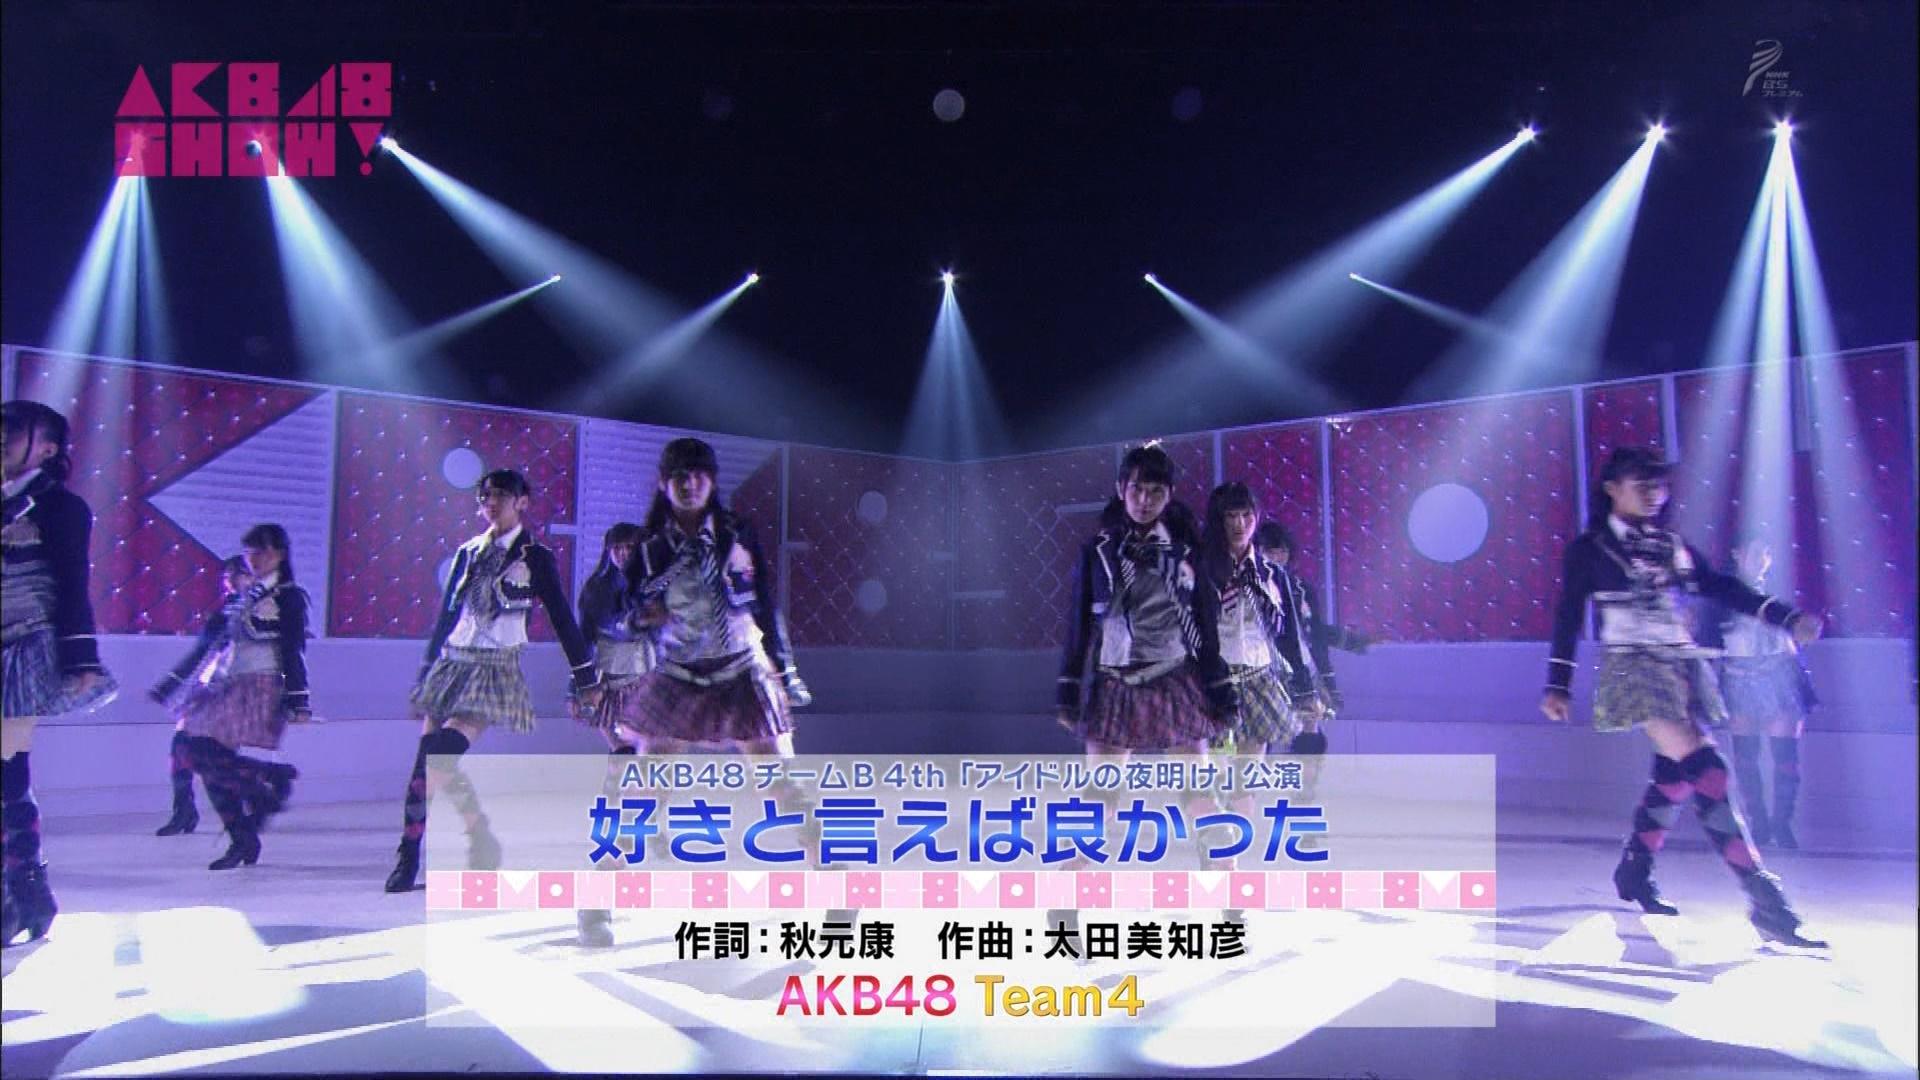 AKB48SHOW チーム4好きといえば良かった 加藤玲奈 20140830